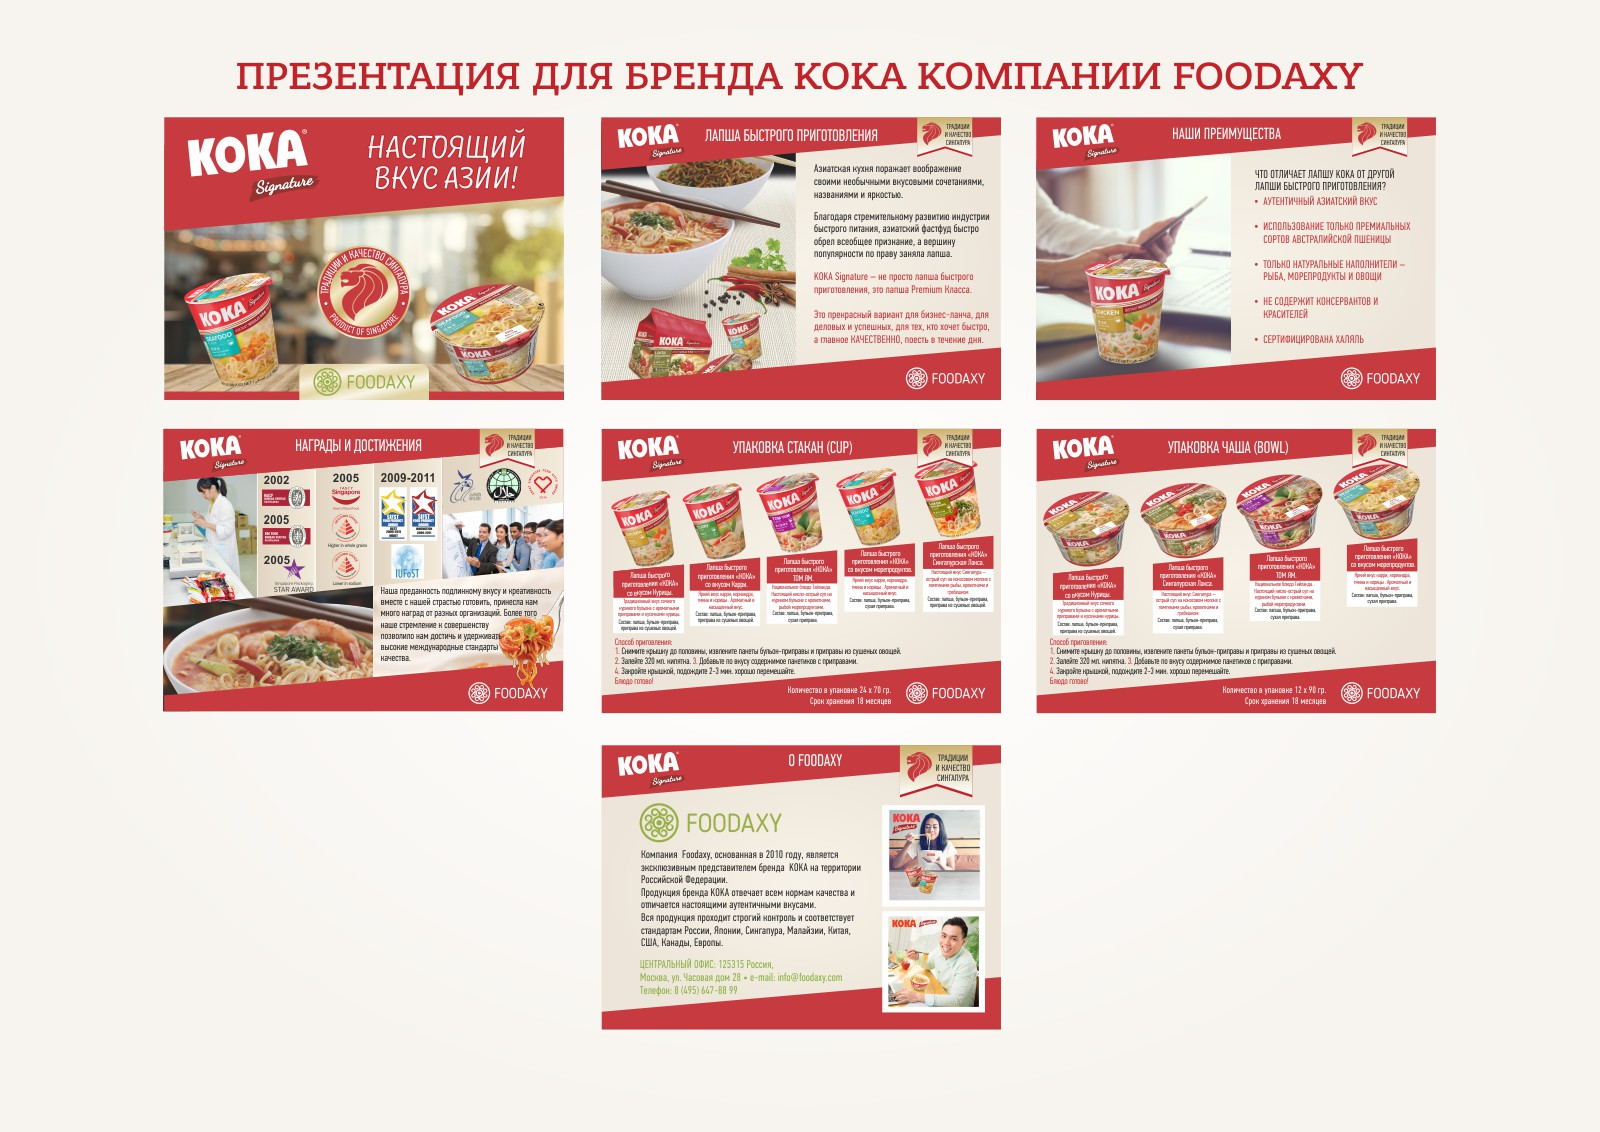 Презентация для бренда KOKA компании FOODAXY